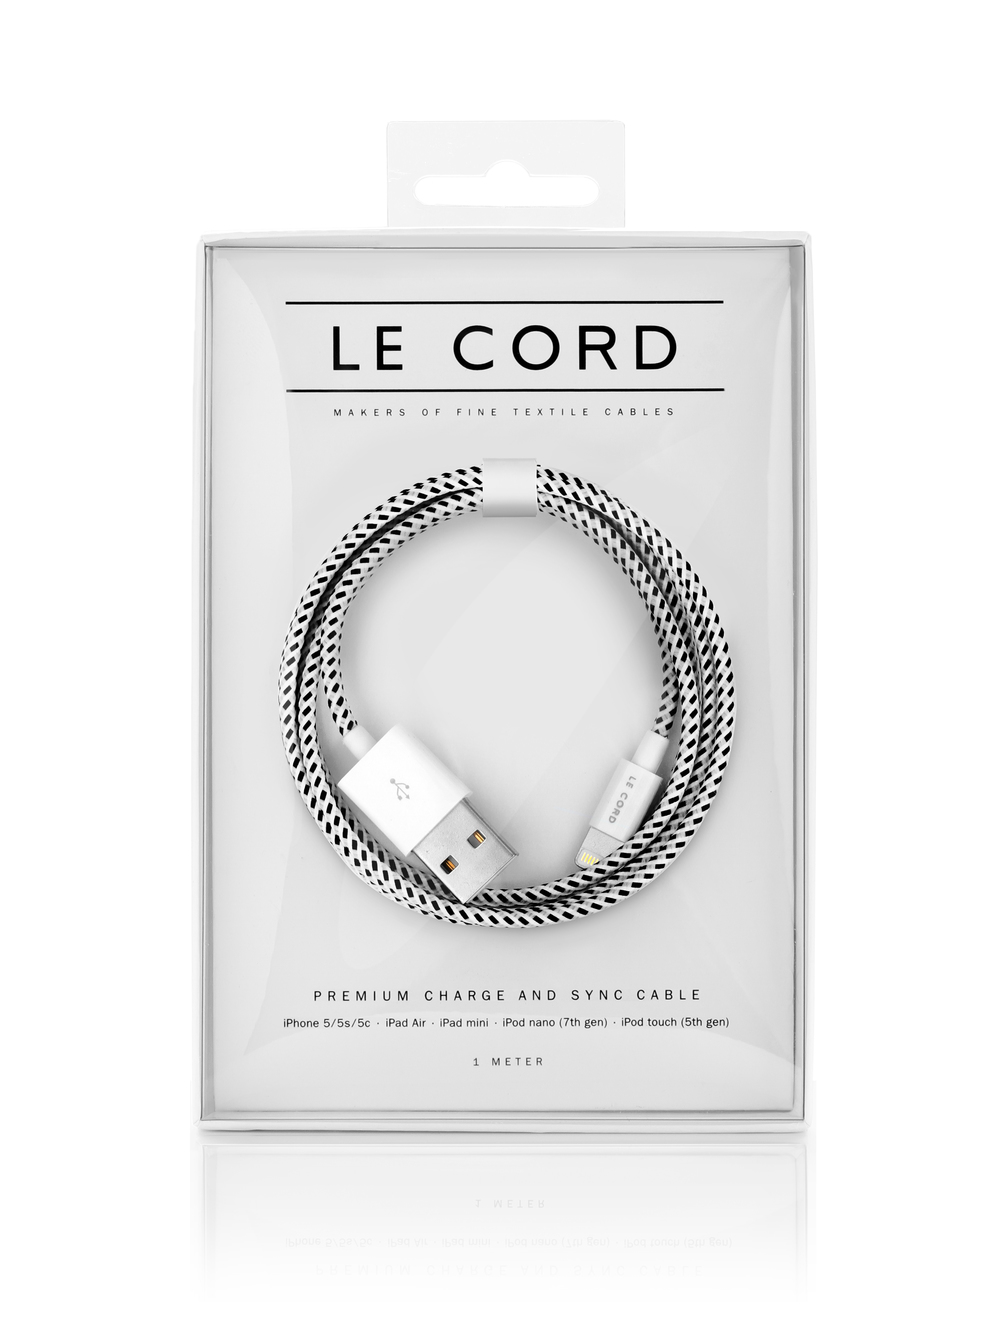 LeCord_Crouwel_WhiteBG_Hires.jpg